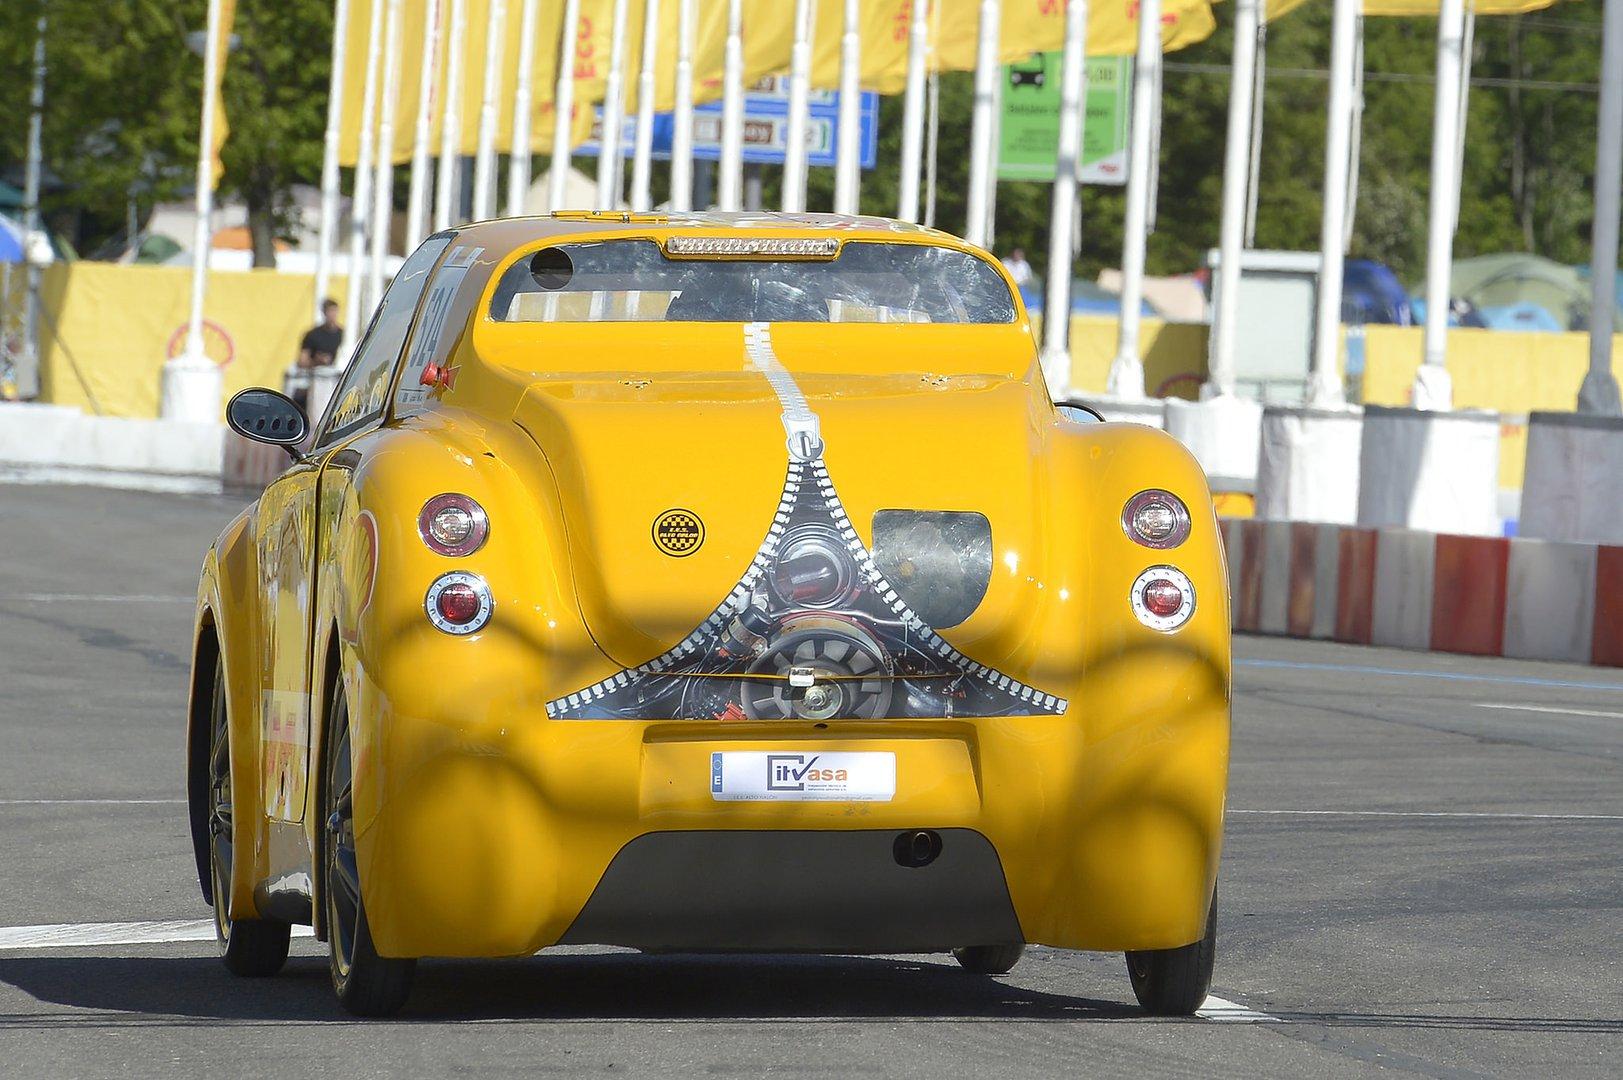 Shell Eco Marathon Europe 2015 New Achievements In Low